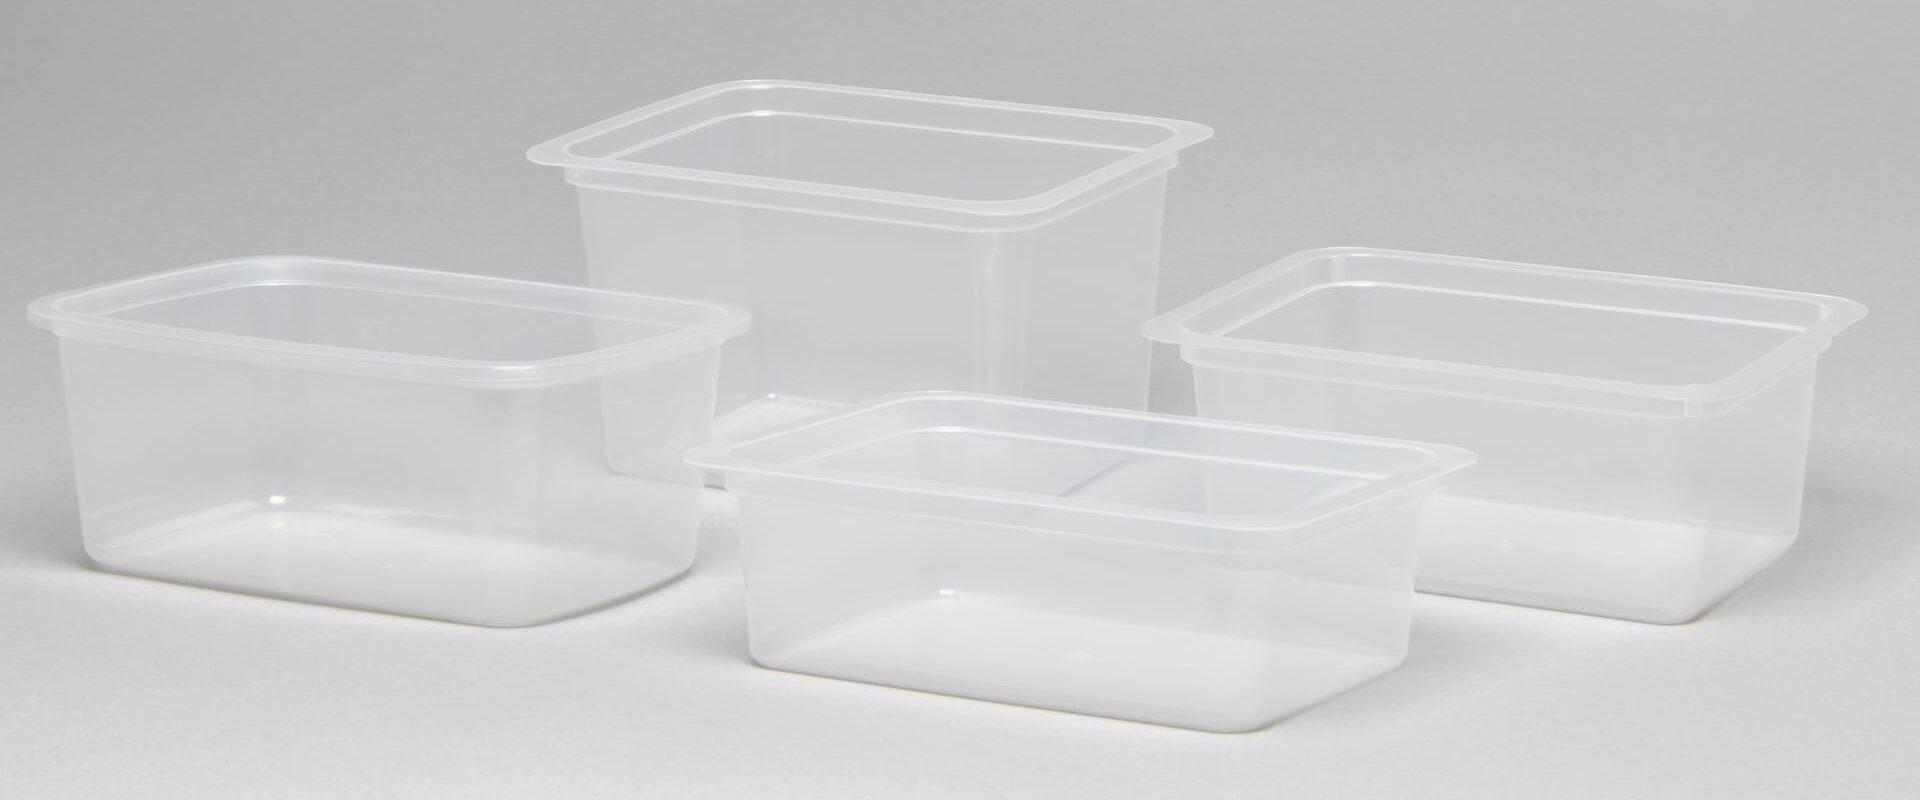 Contenitori in plastica trasparente per termosaldatura